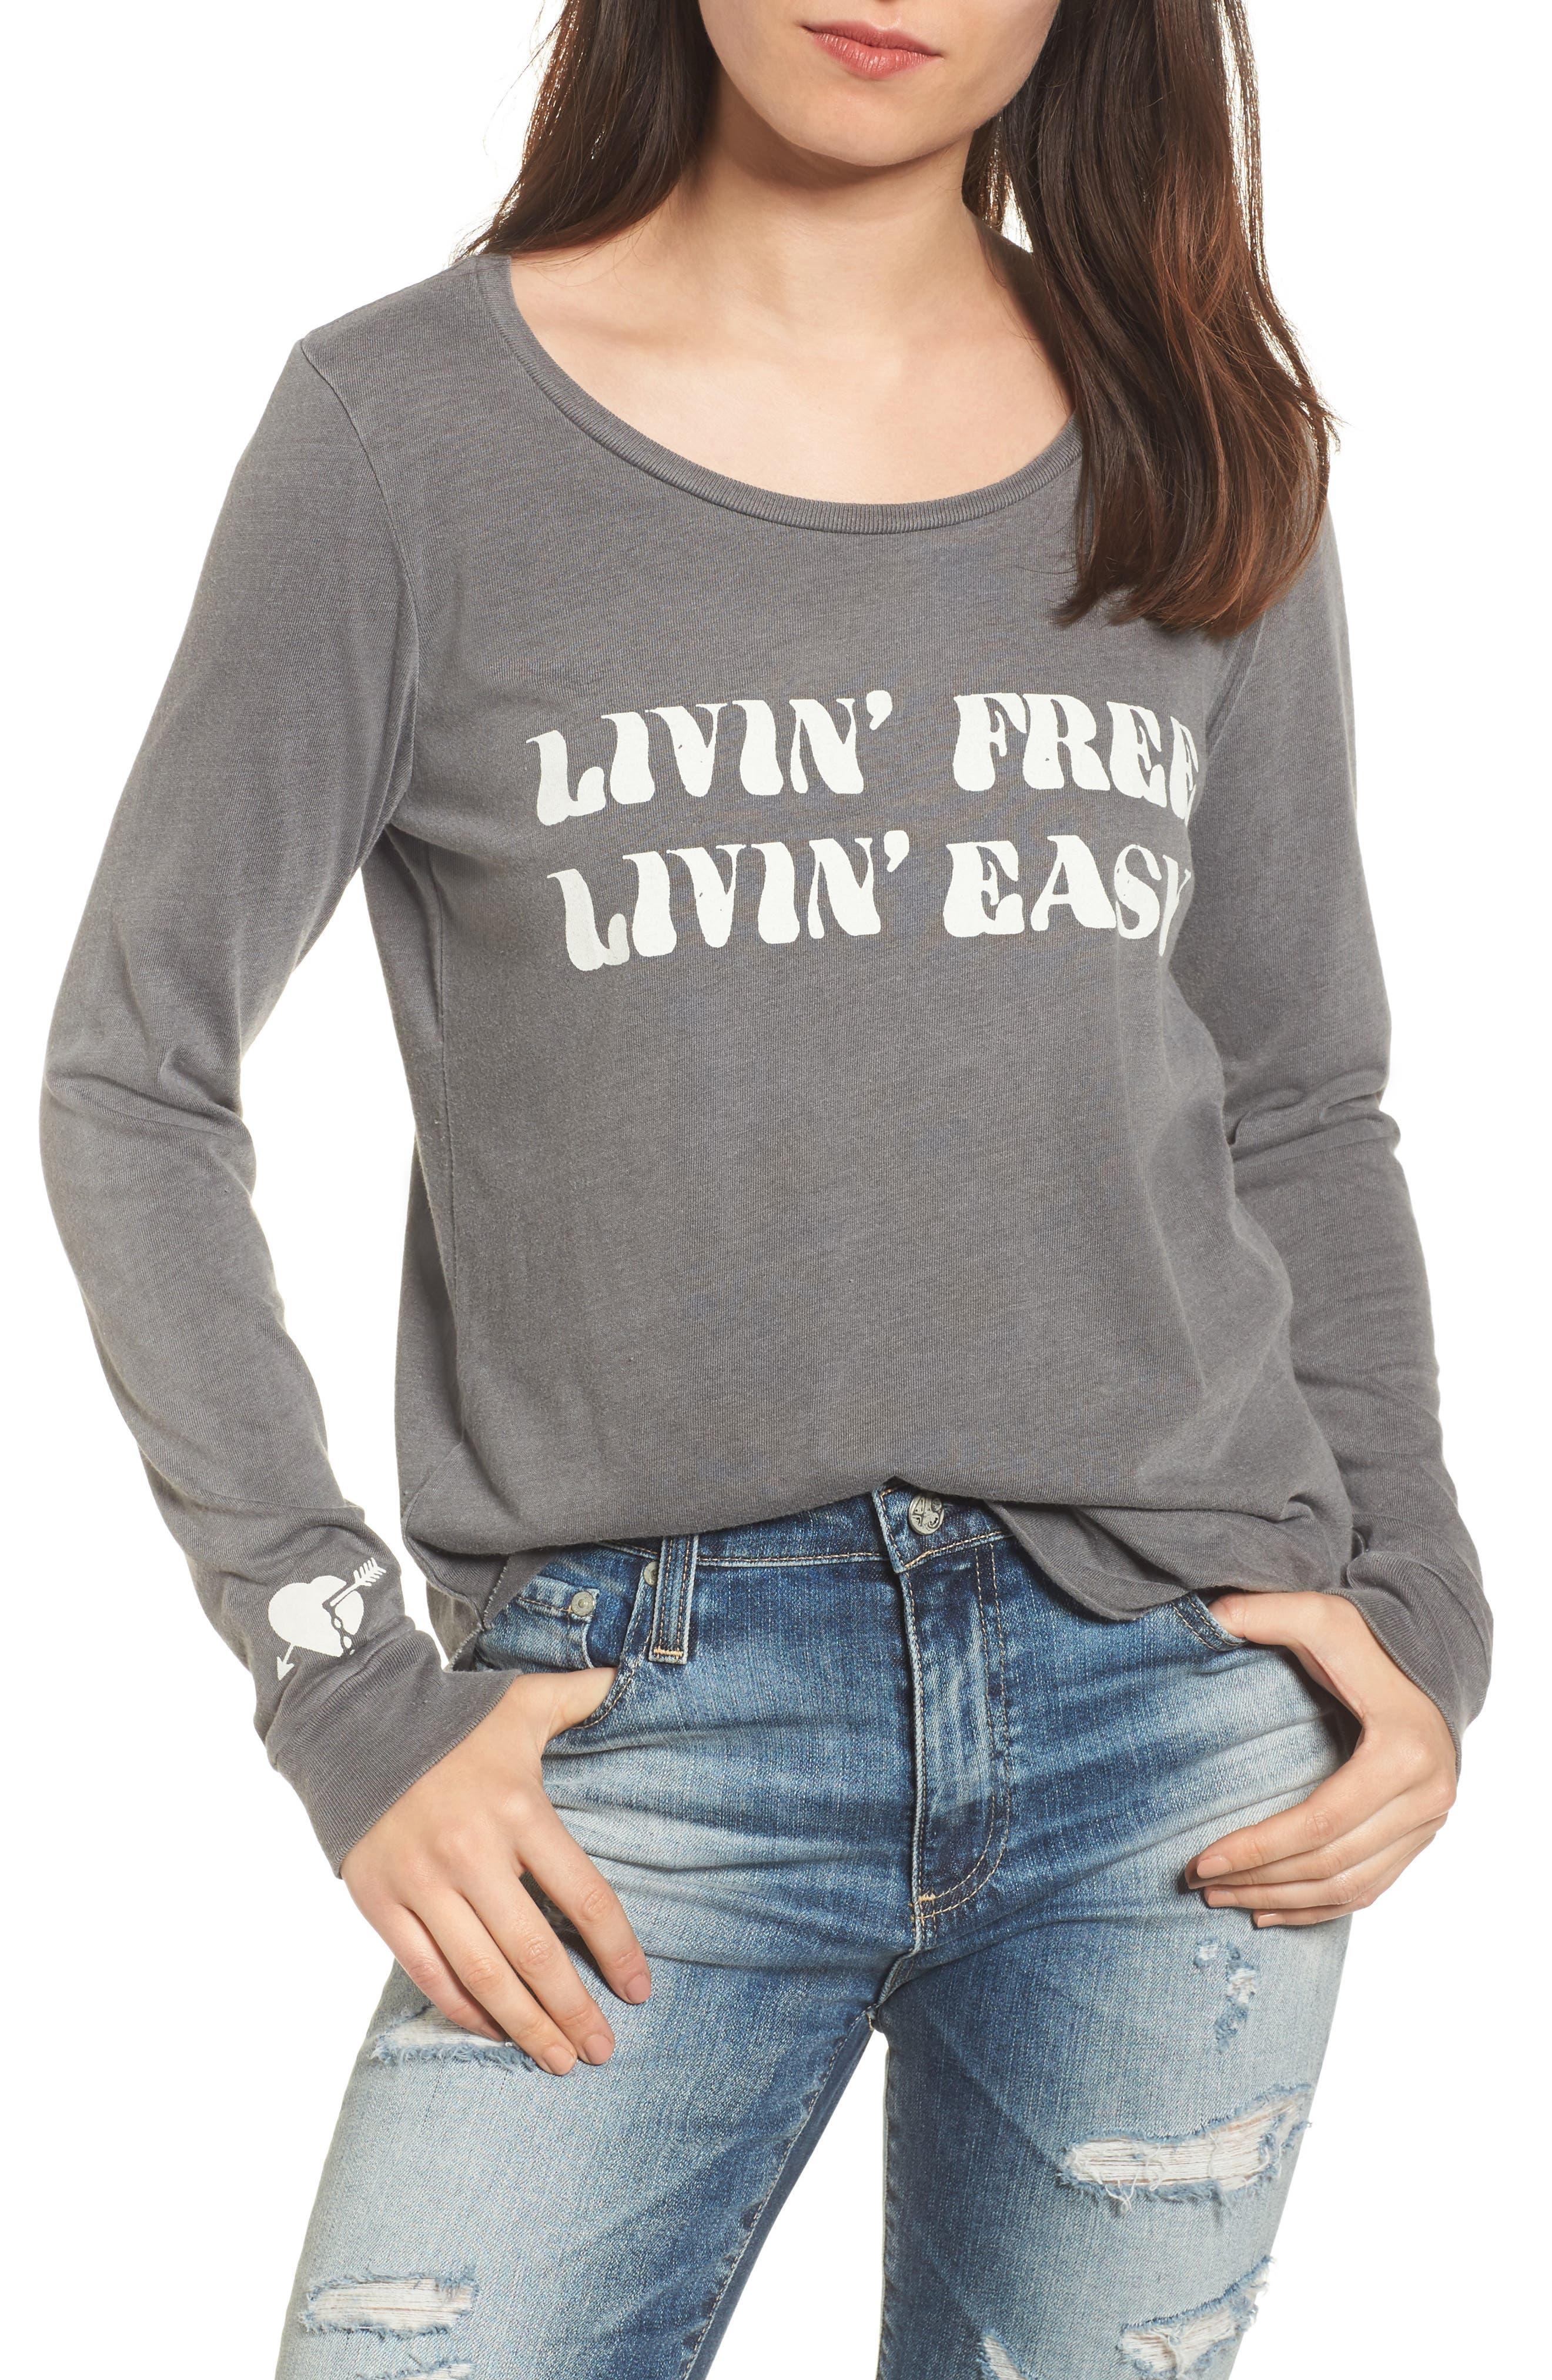 Livin' Free Livin' Easy Top,                         Main,                         color, 088